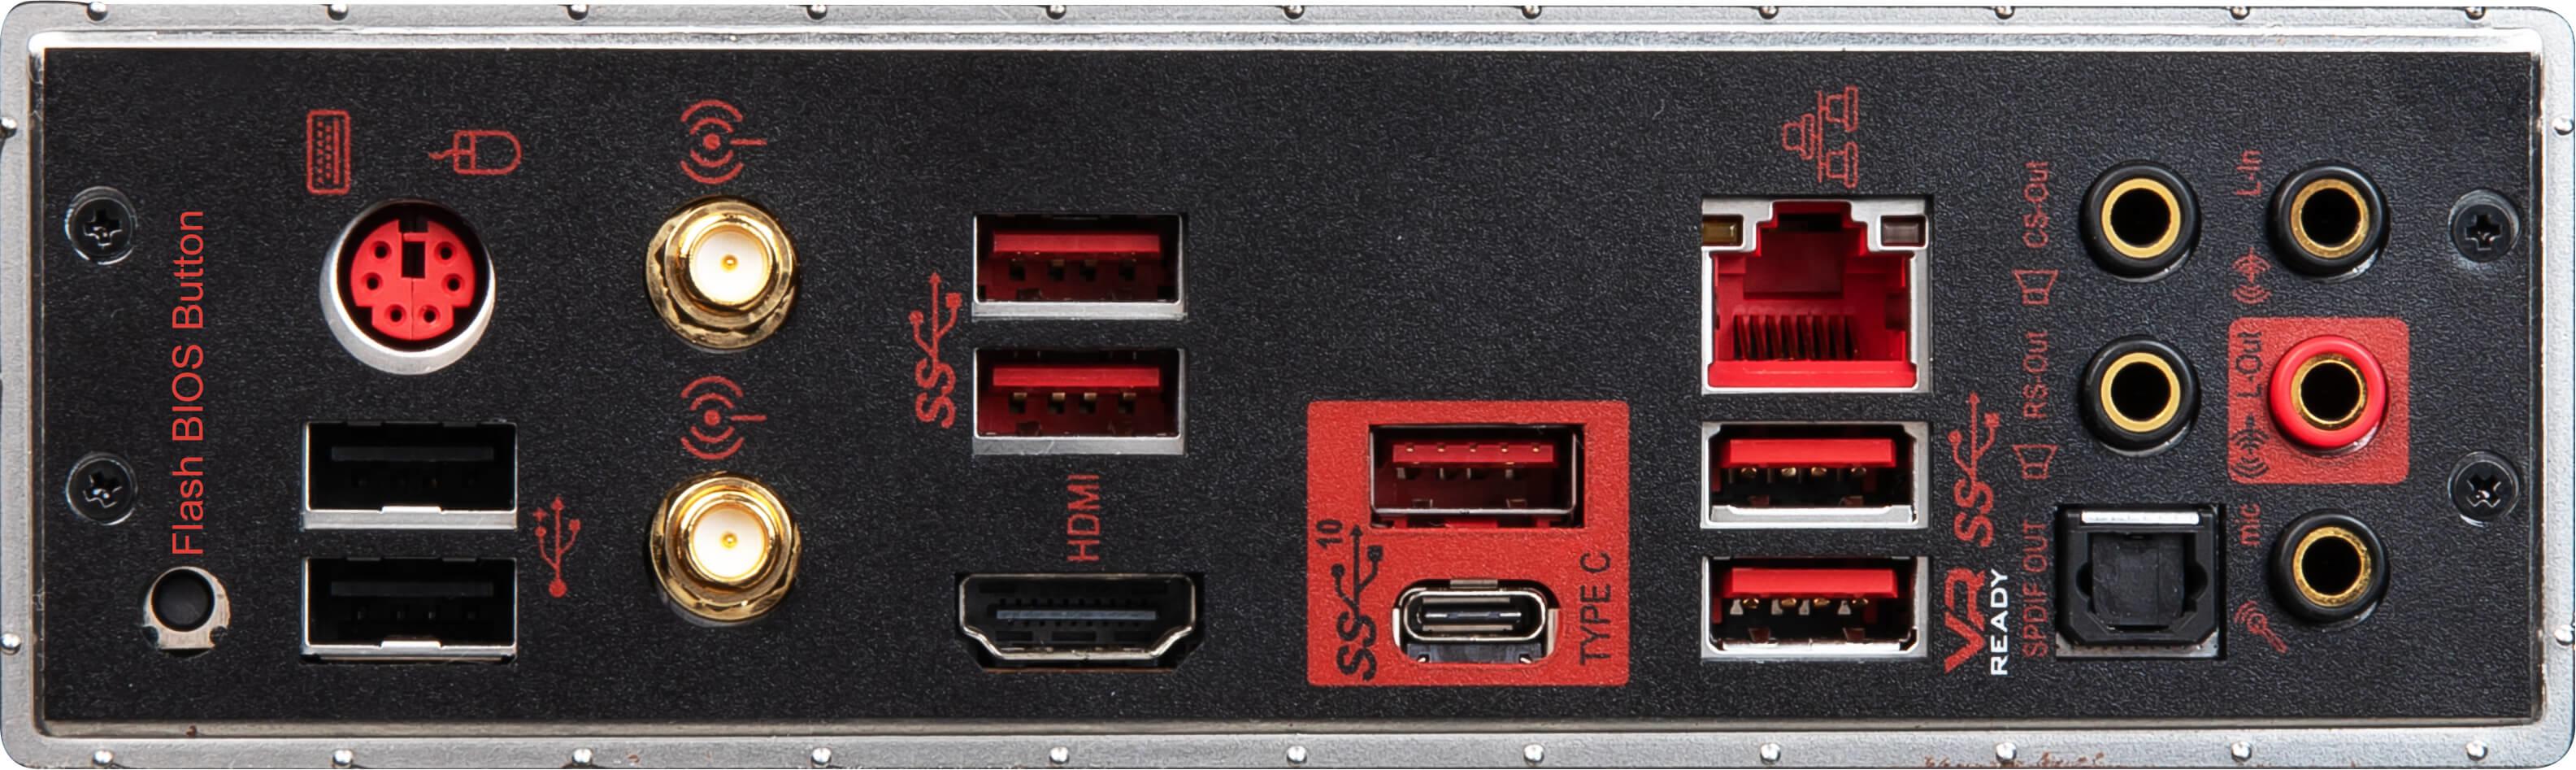 MSI - Motherboard MSI MPG X570 GAMING EDGE WIFI